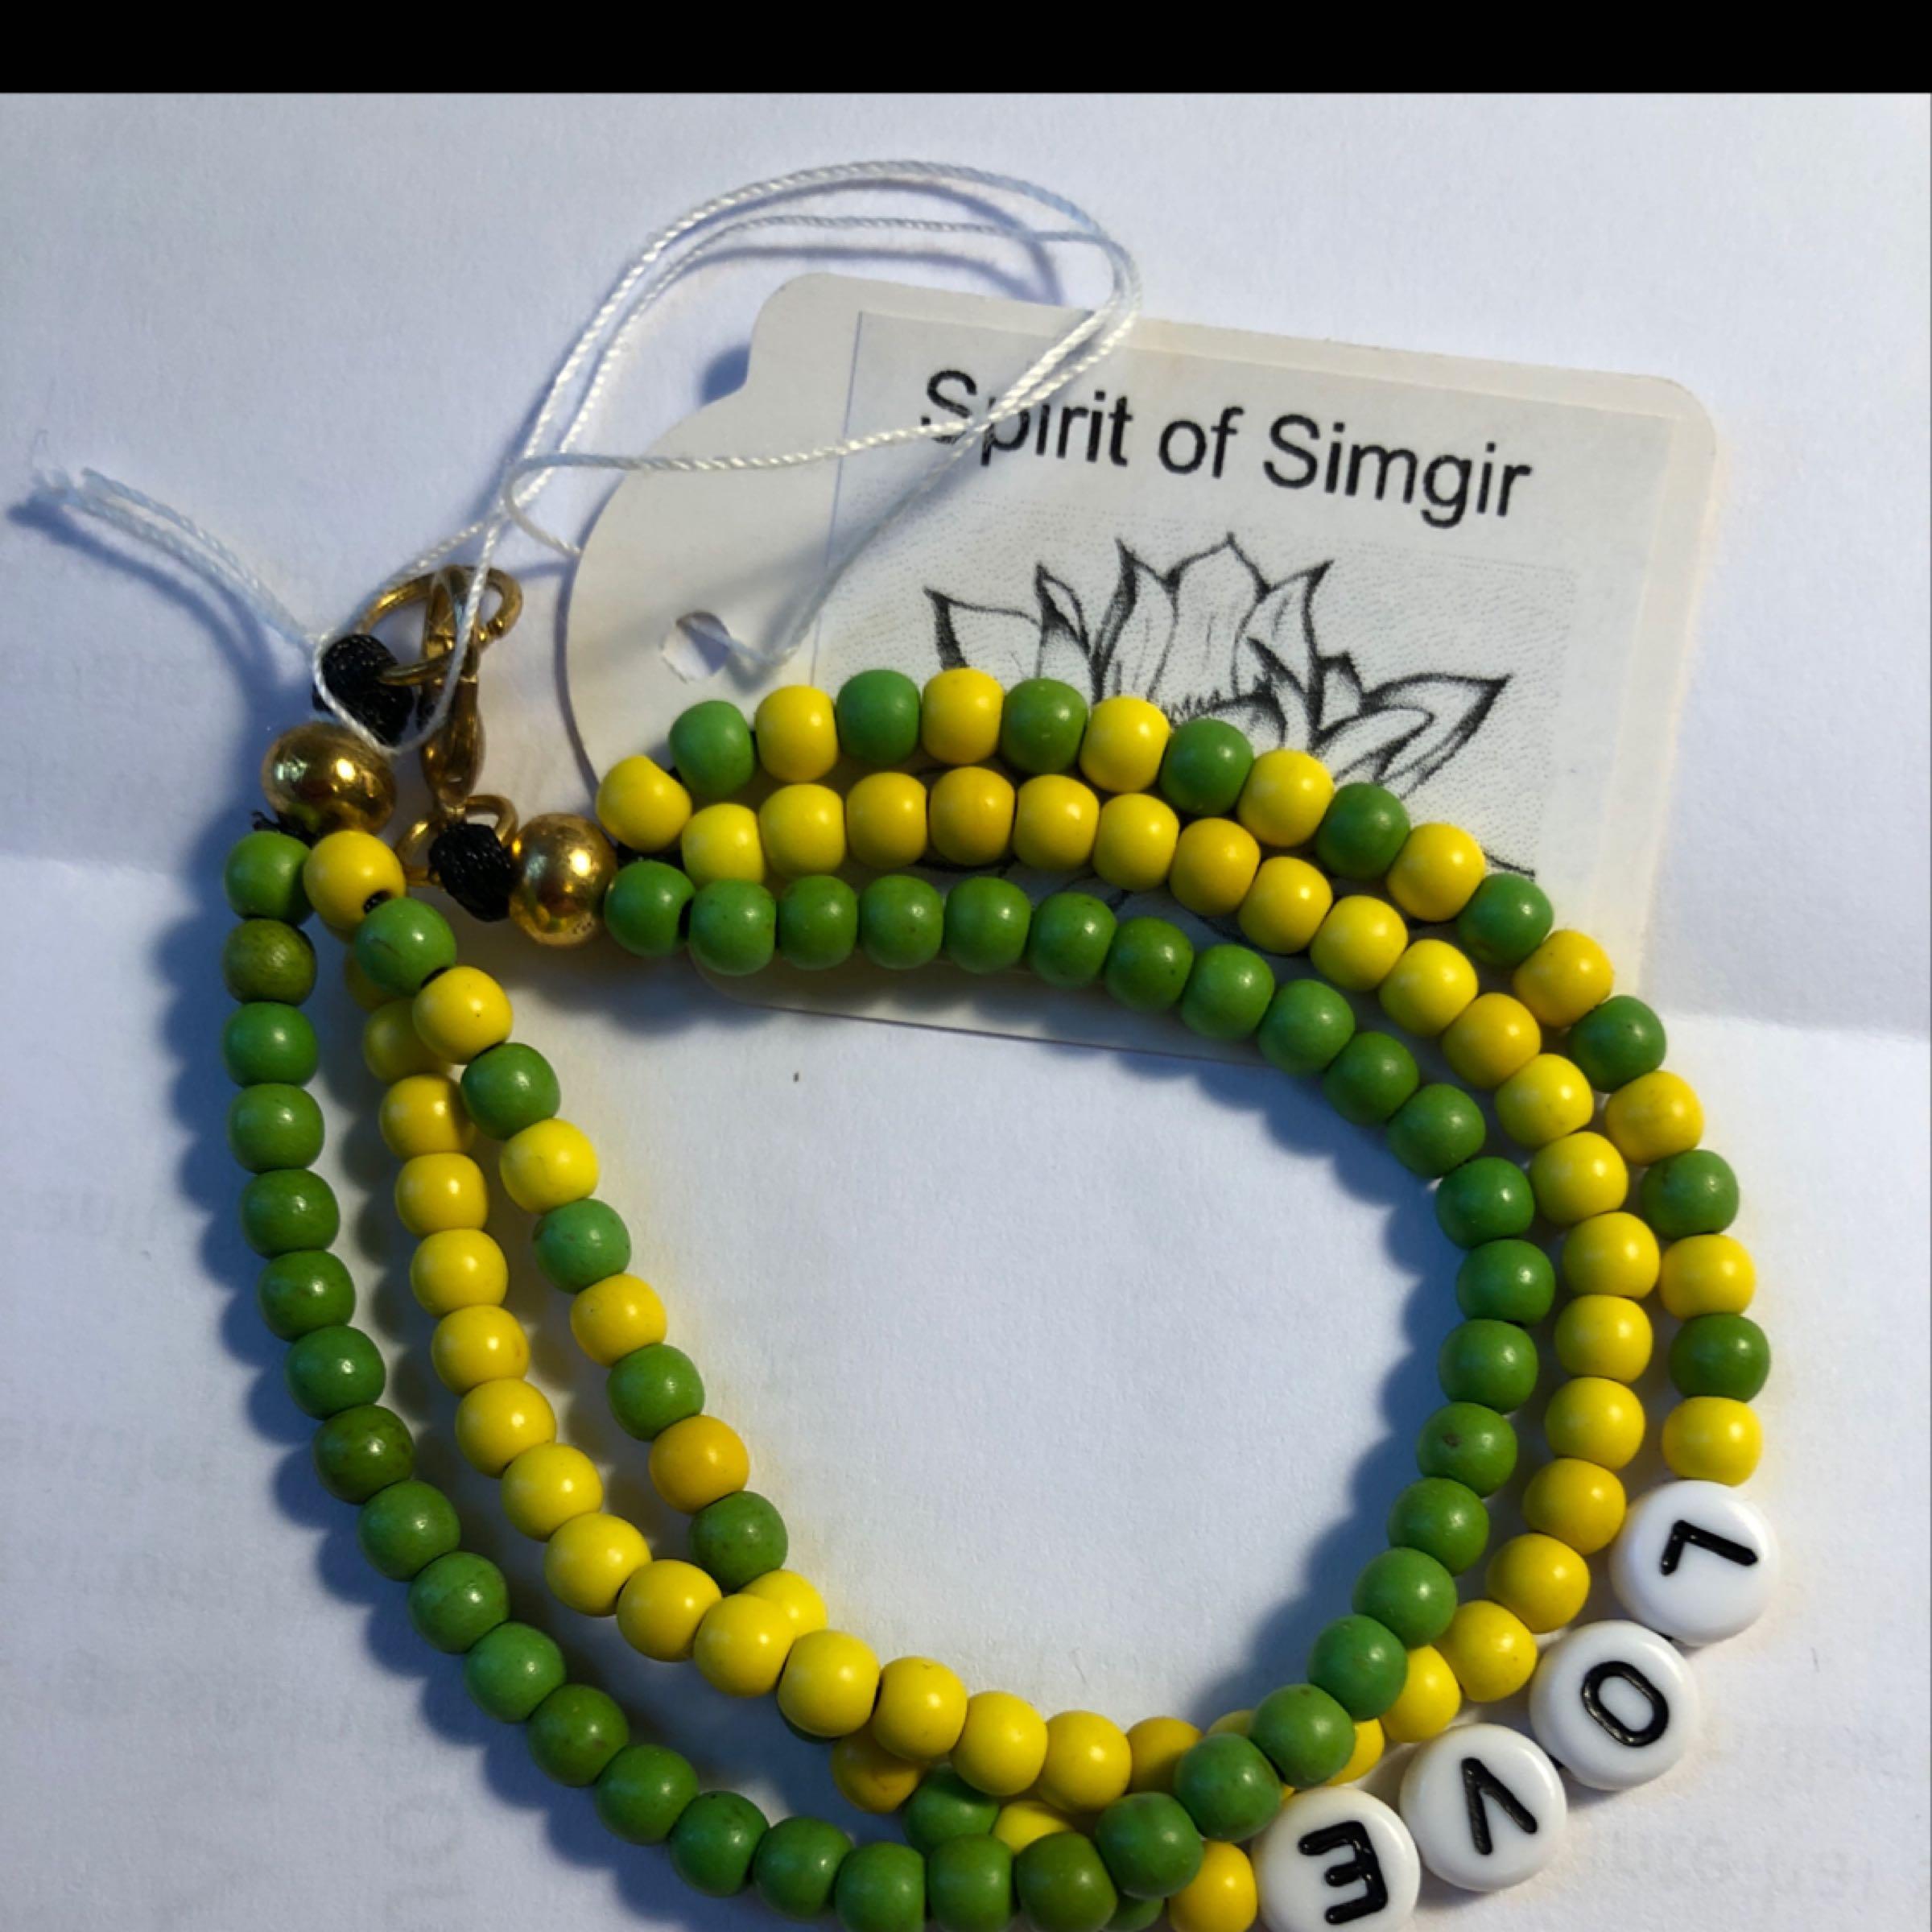 7. Armband Spirit of Simgir Känn kärleken